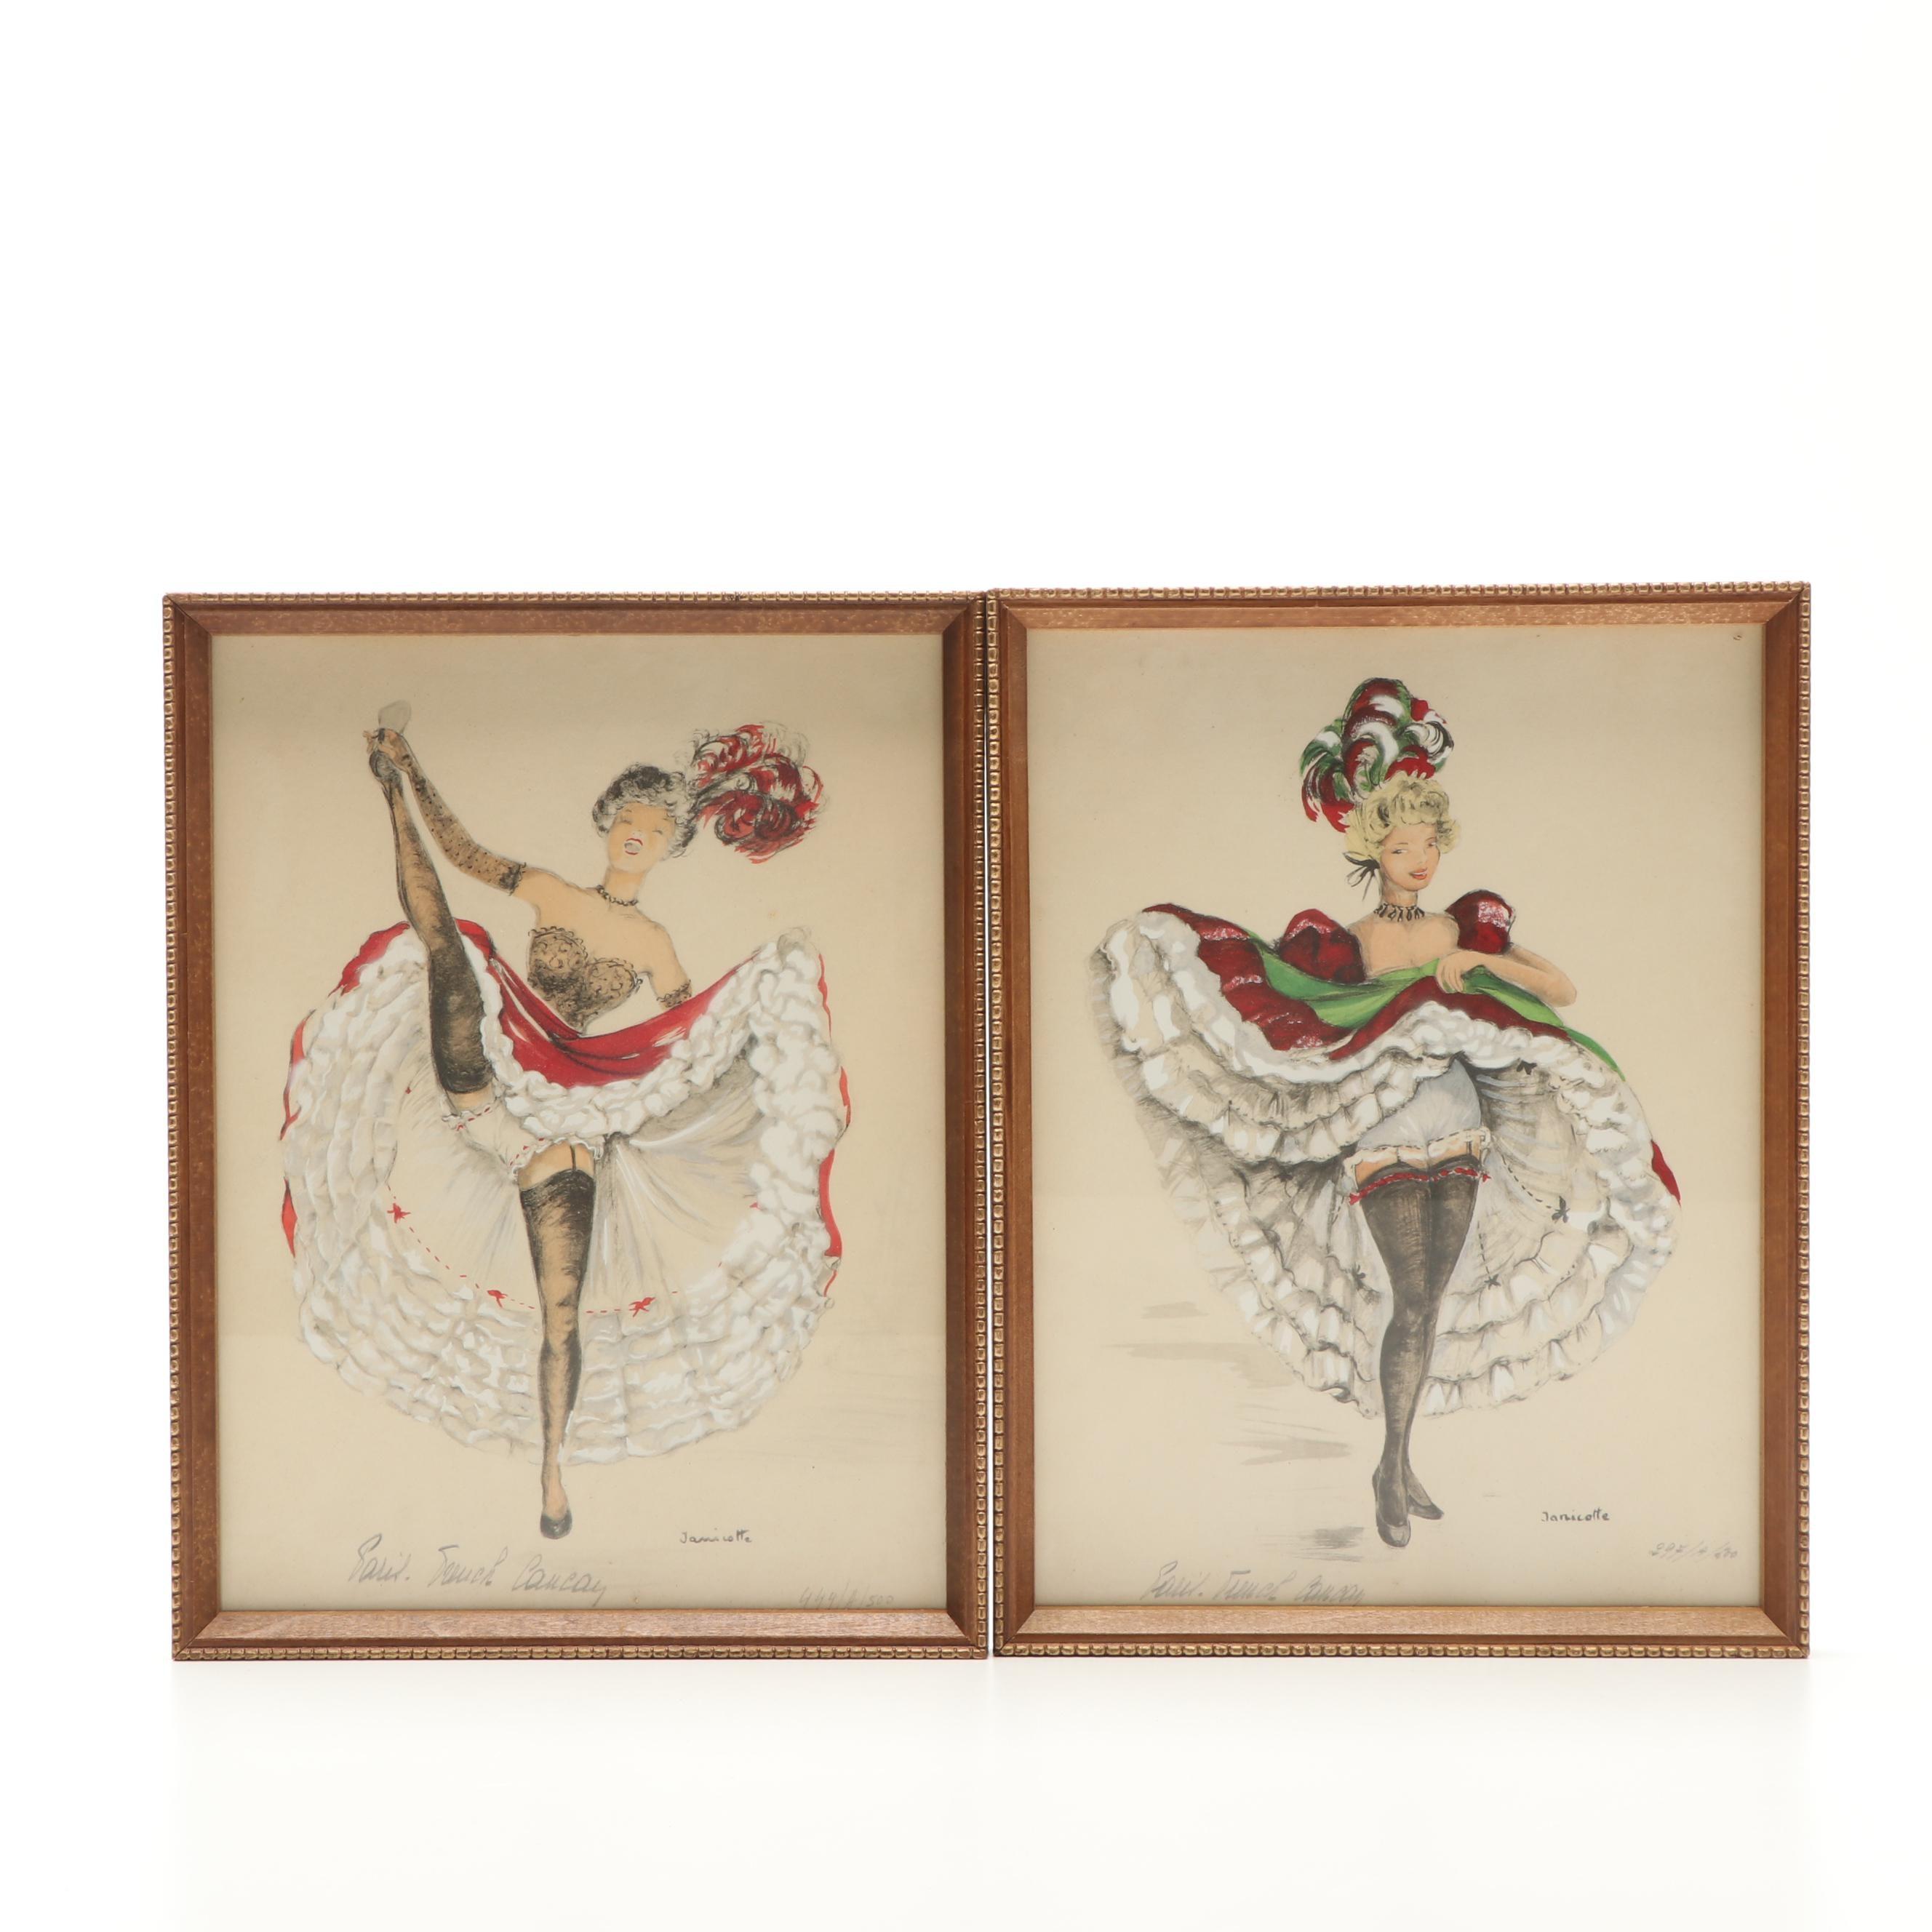 Janicotte Dancer Lithographs